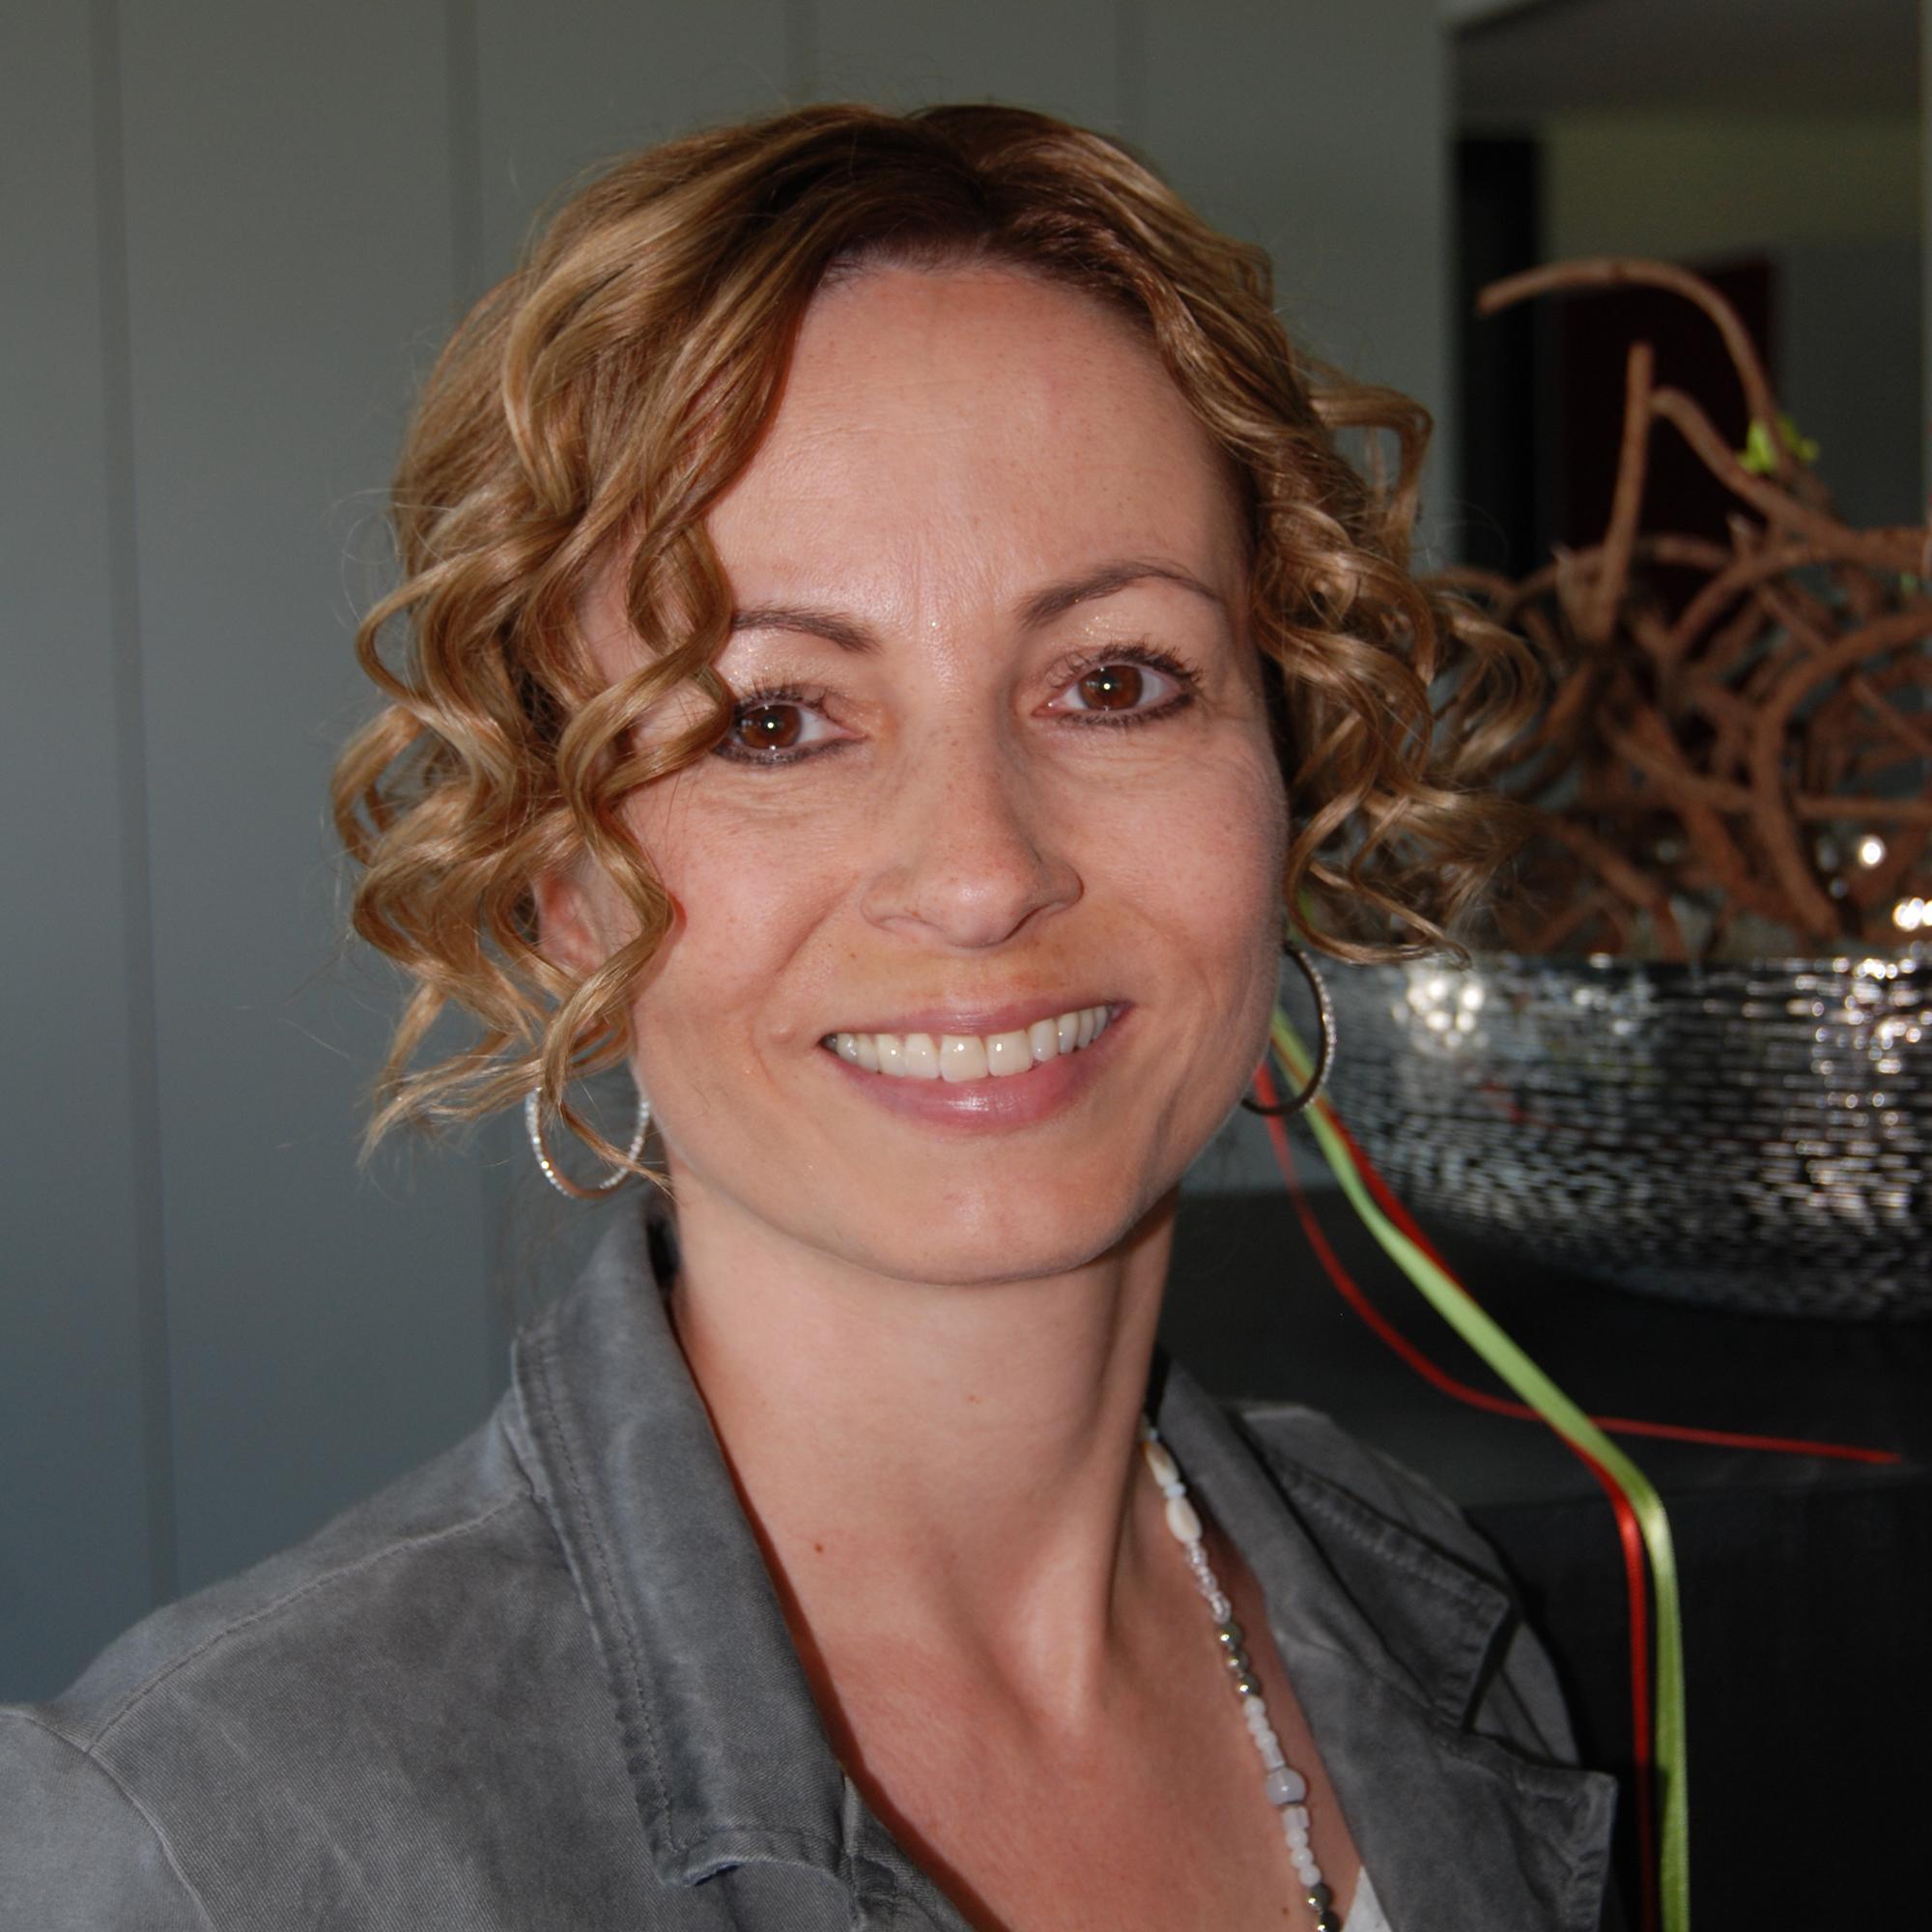 Karin Haltinner